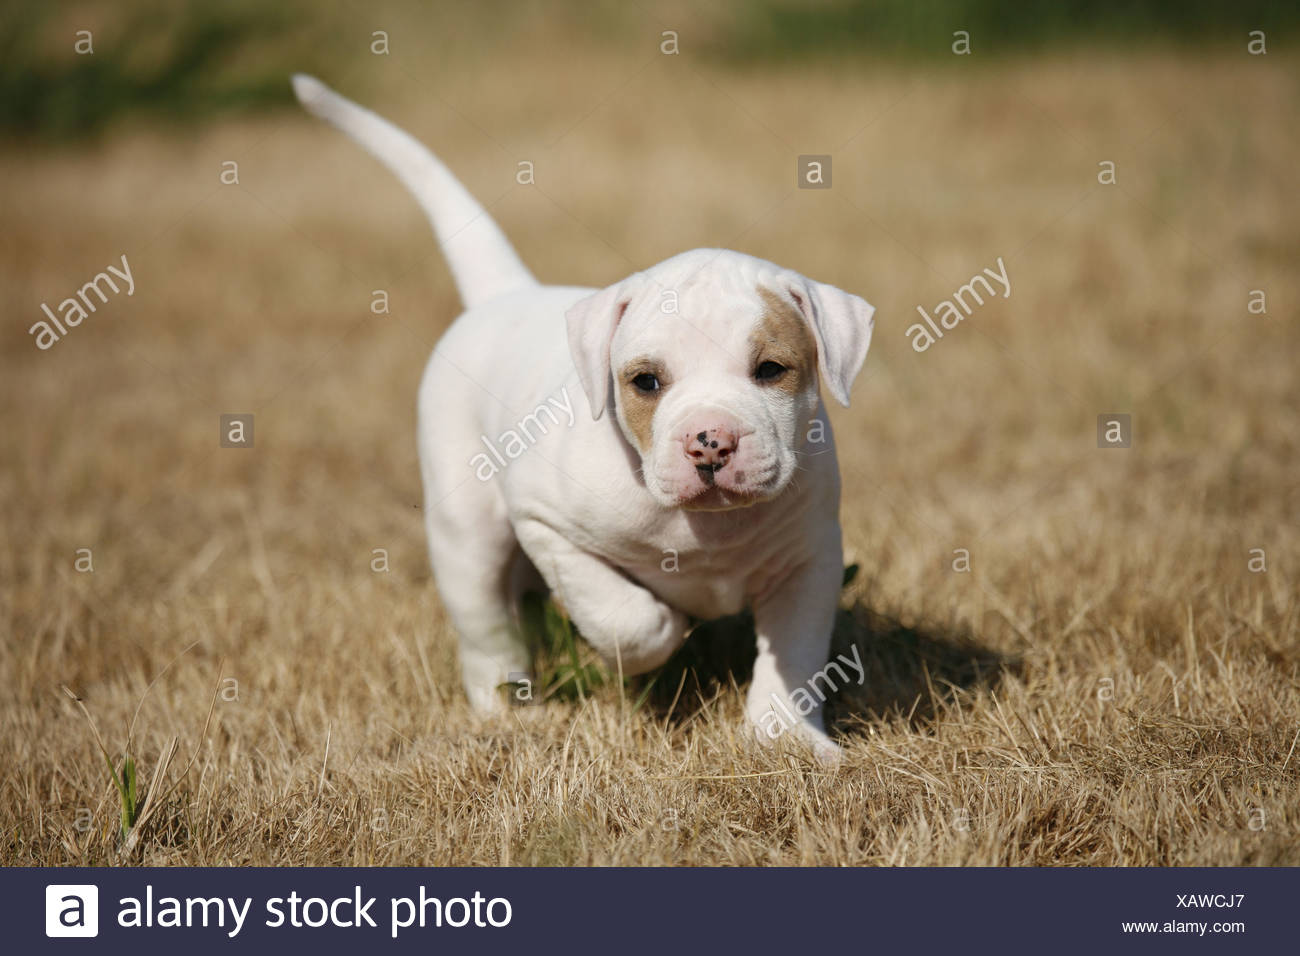 Amerikanische Bulldogge Welpe American Bulldog Welpen Stockfotografie Alamy